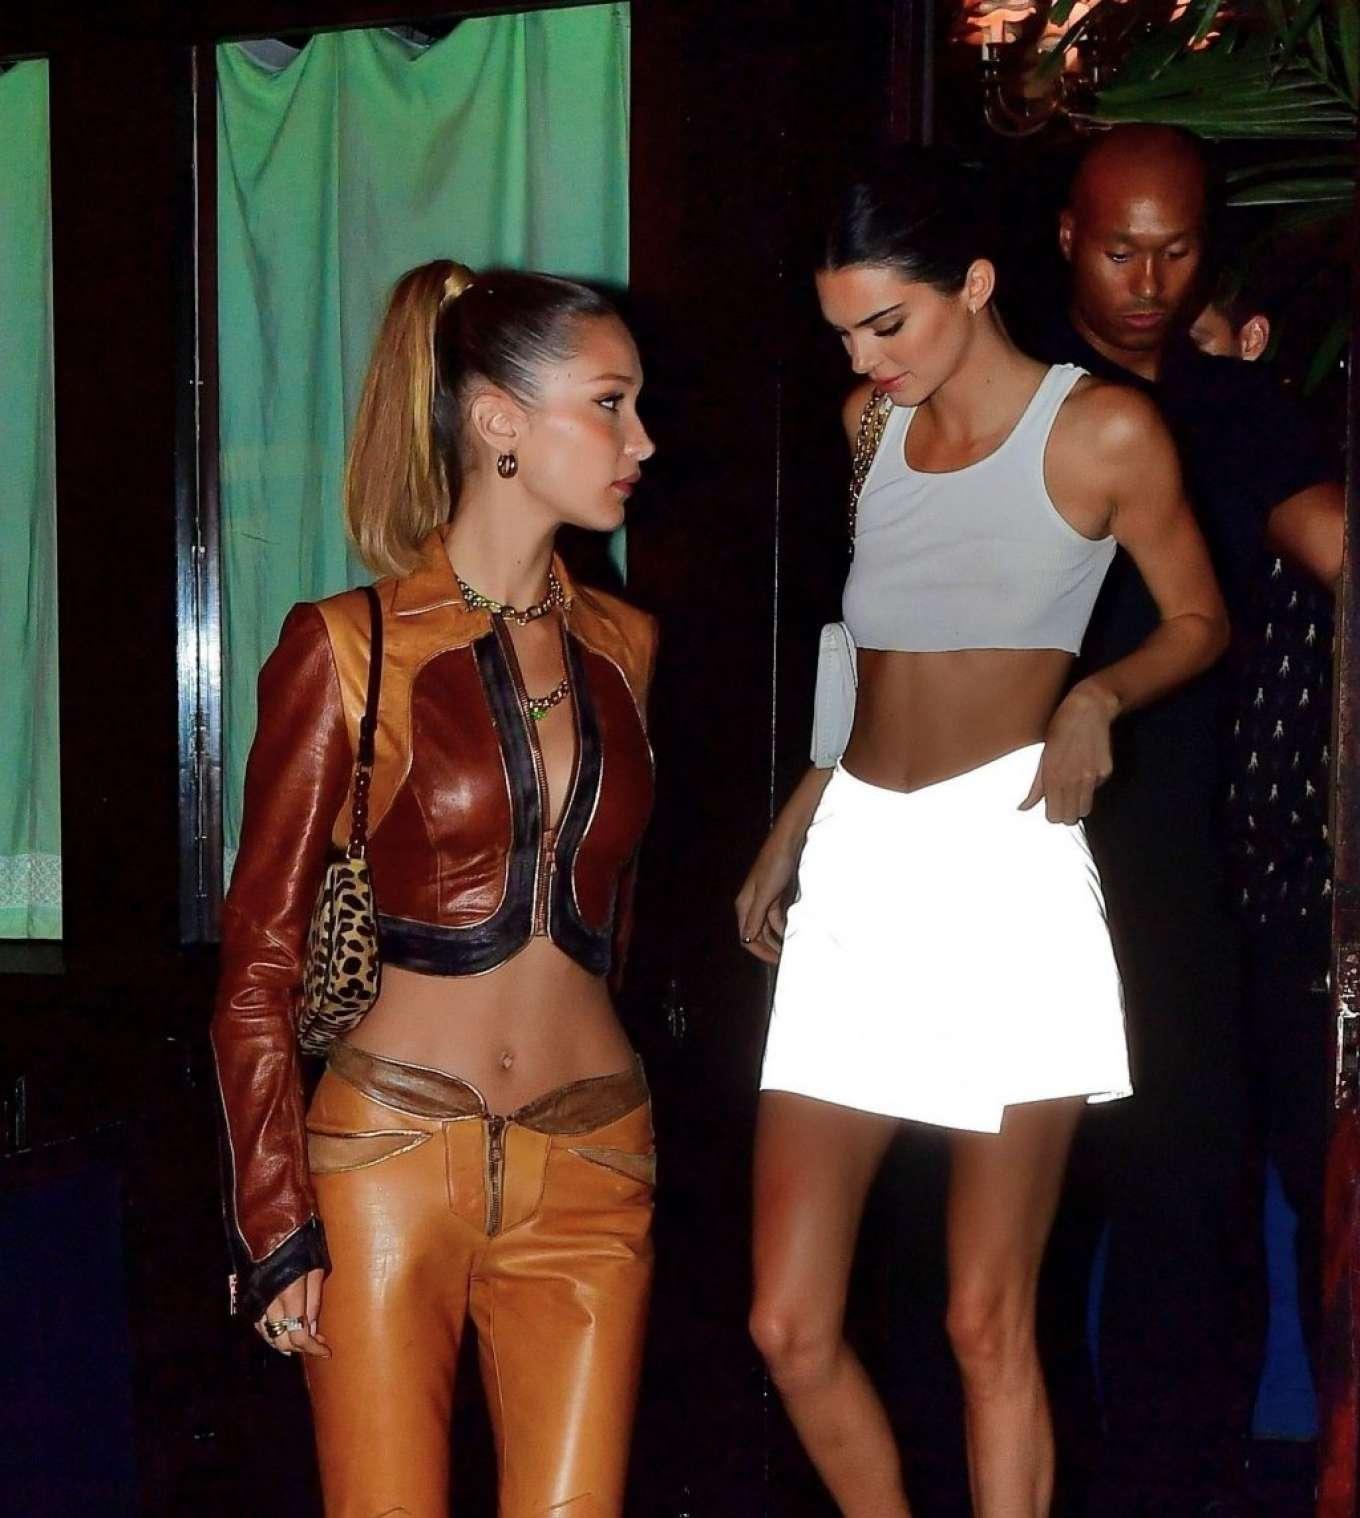 Bella Hadid and Kendall Jenner at Avenue nightclub